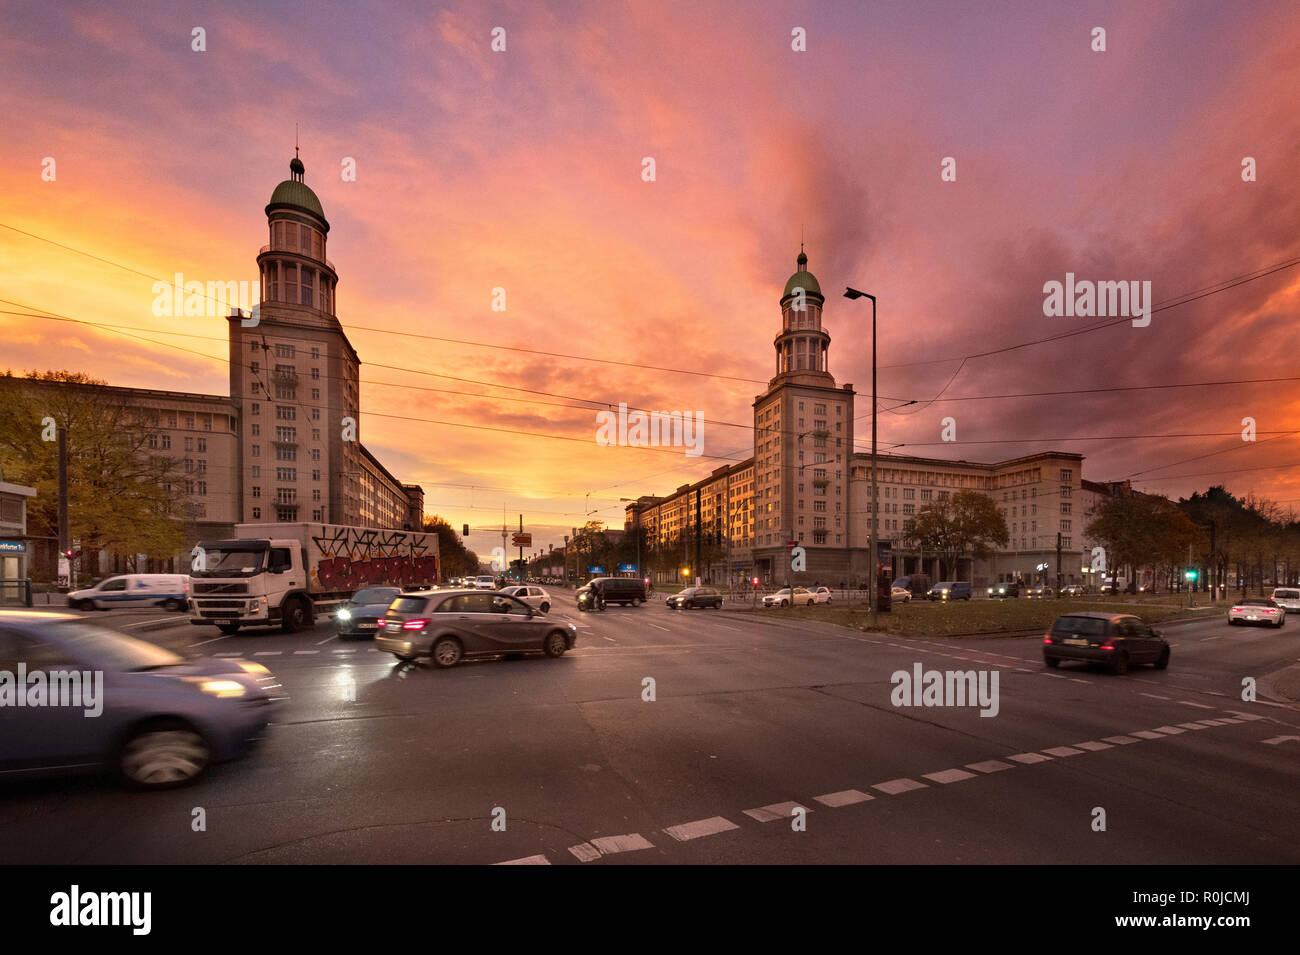 Frankfurter Tor, Friedrichshain, Berlin, Germany - Stock Image